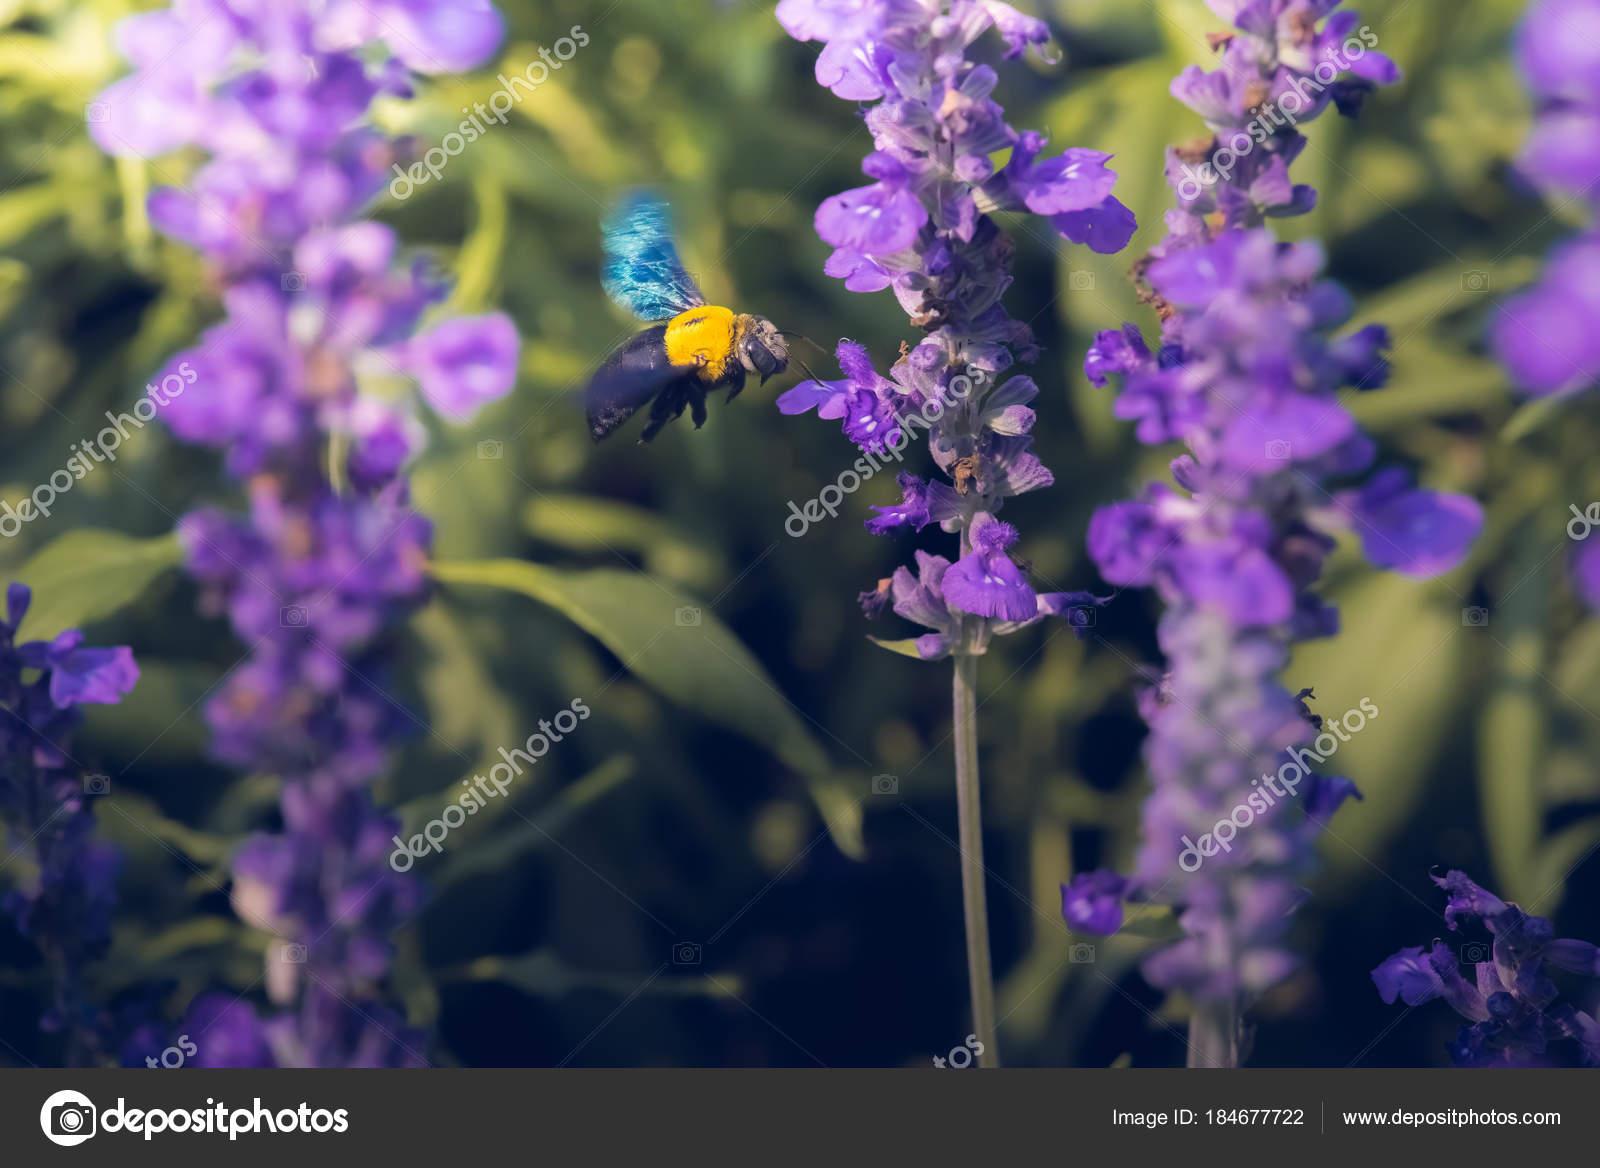 Carpenter bee flying beautiful flowers nature stock photo carpenter bee are flying to beautiful flowers in nature photo by panomja7gmail izmirmasajfo